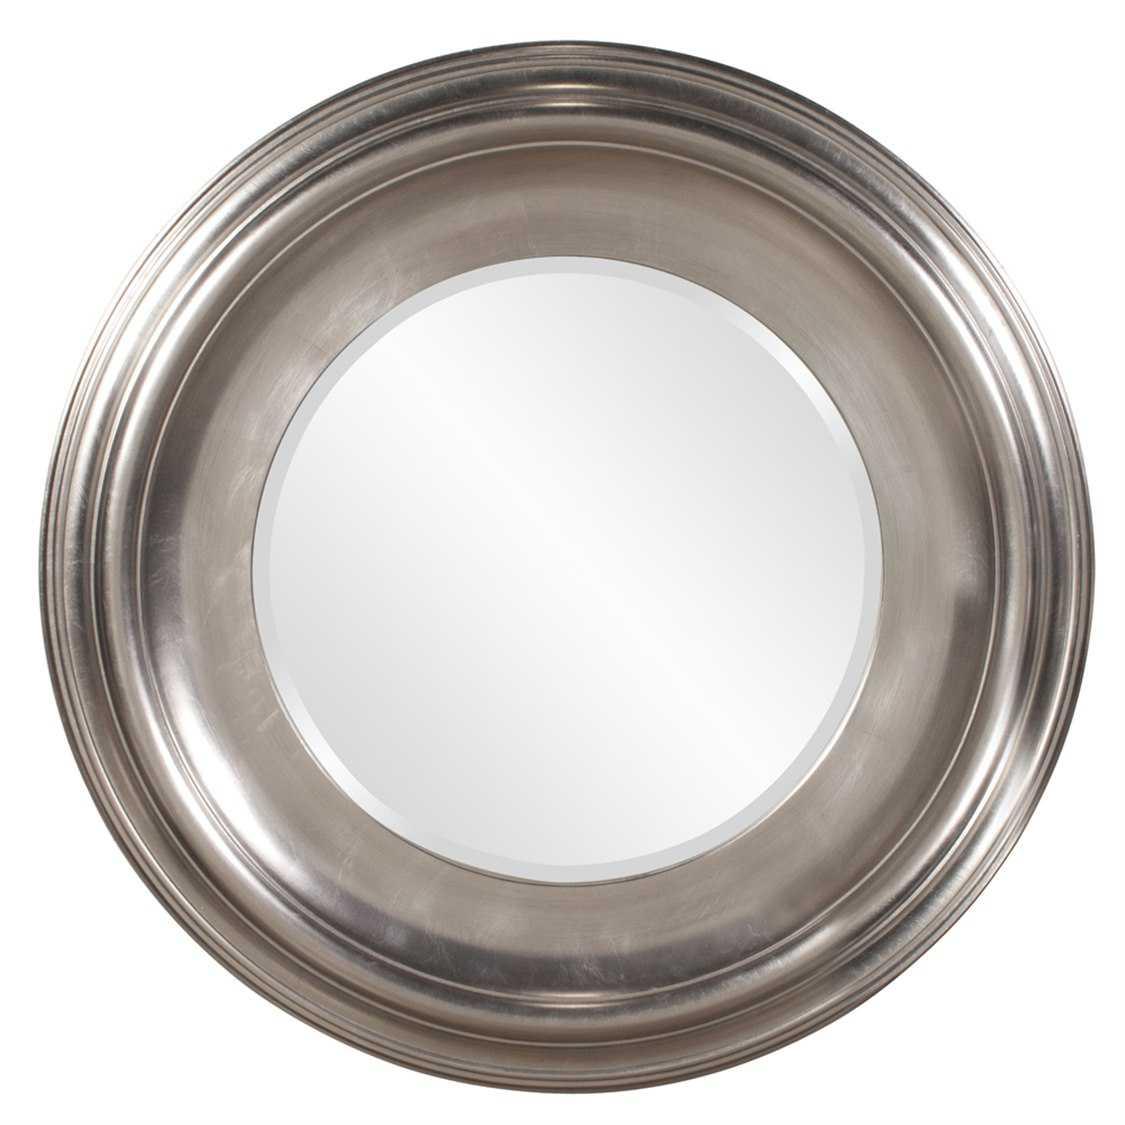 Howard elliott christian 39 round silver wall mirror 56084 for Round silver wall mirror